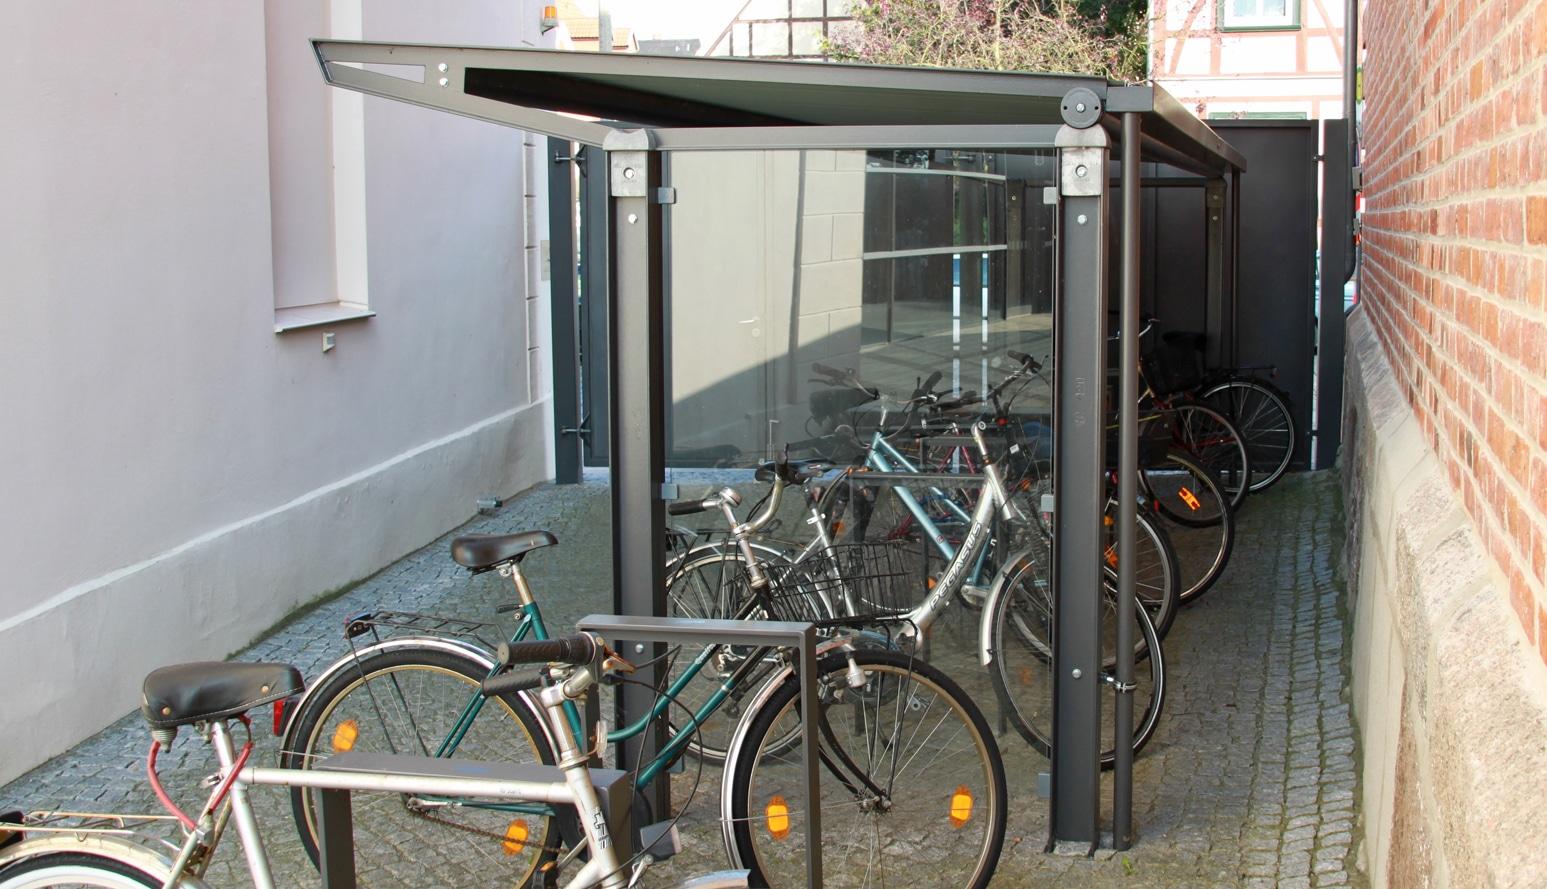 Überdachung forum d4 | bike and ride gmbh